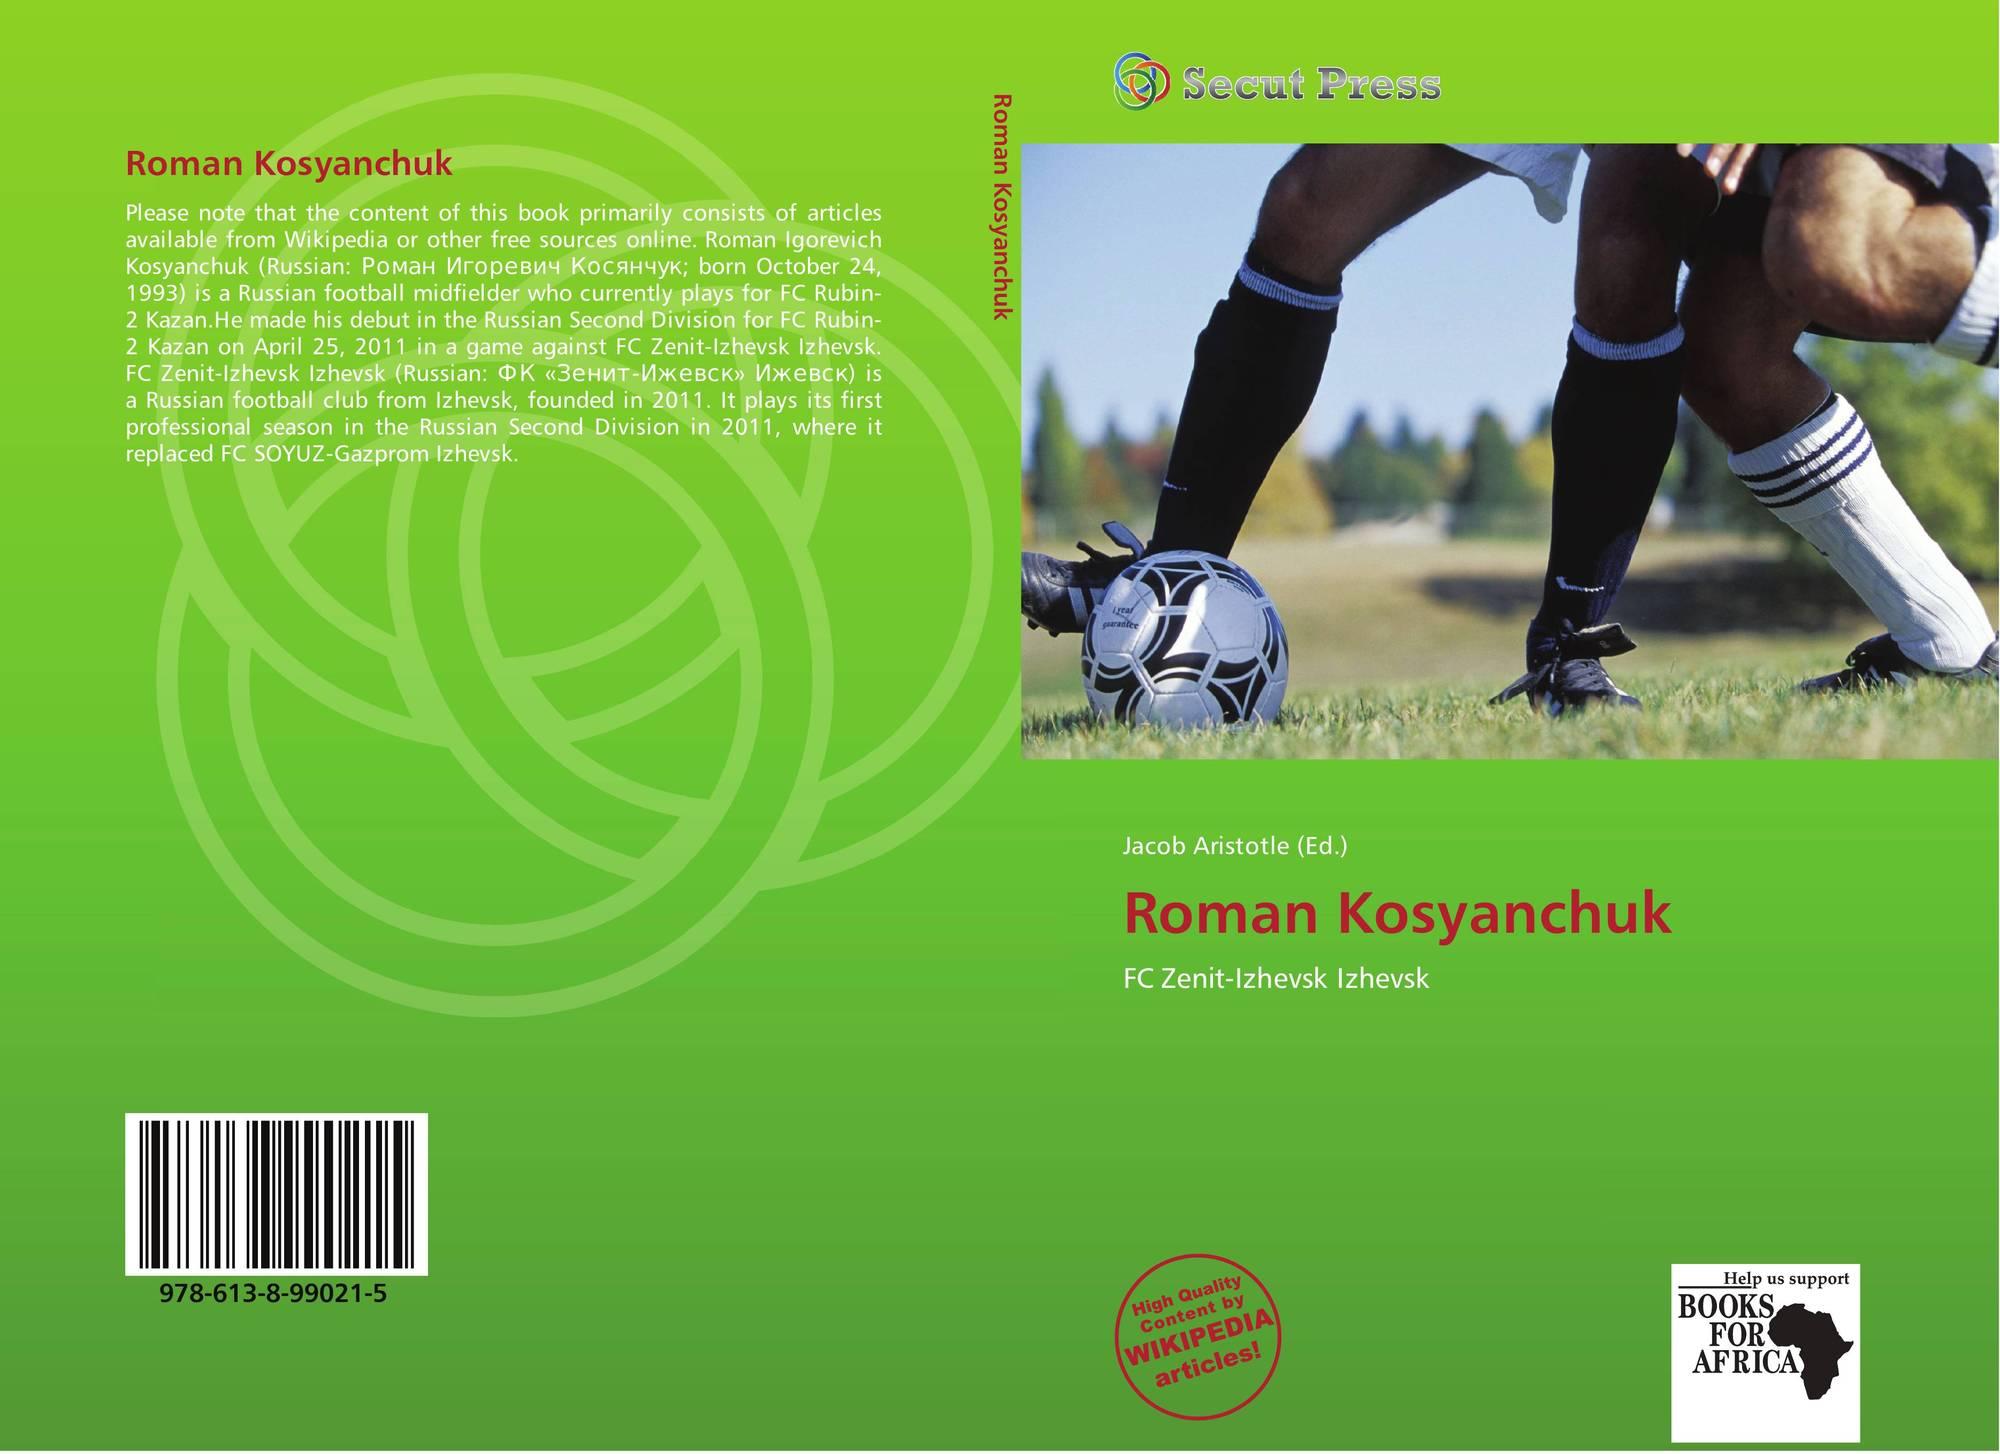 Roman Kosyanchuk 978 613 8 99021 5 6138990218 9786138990215